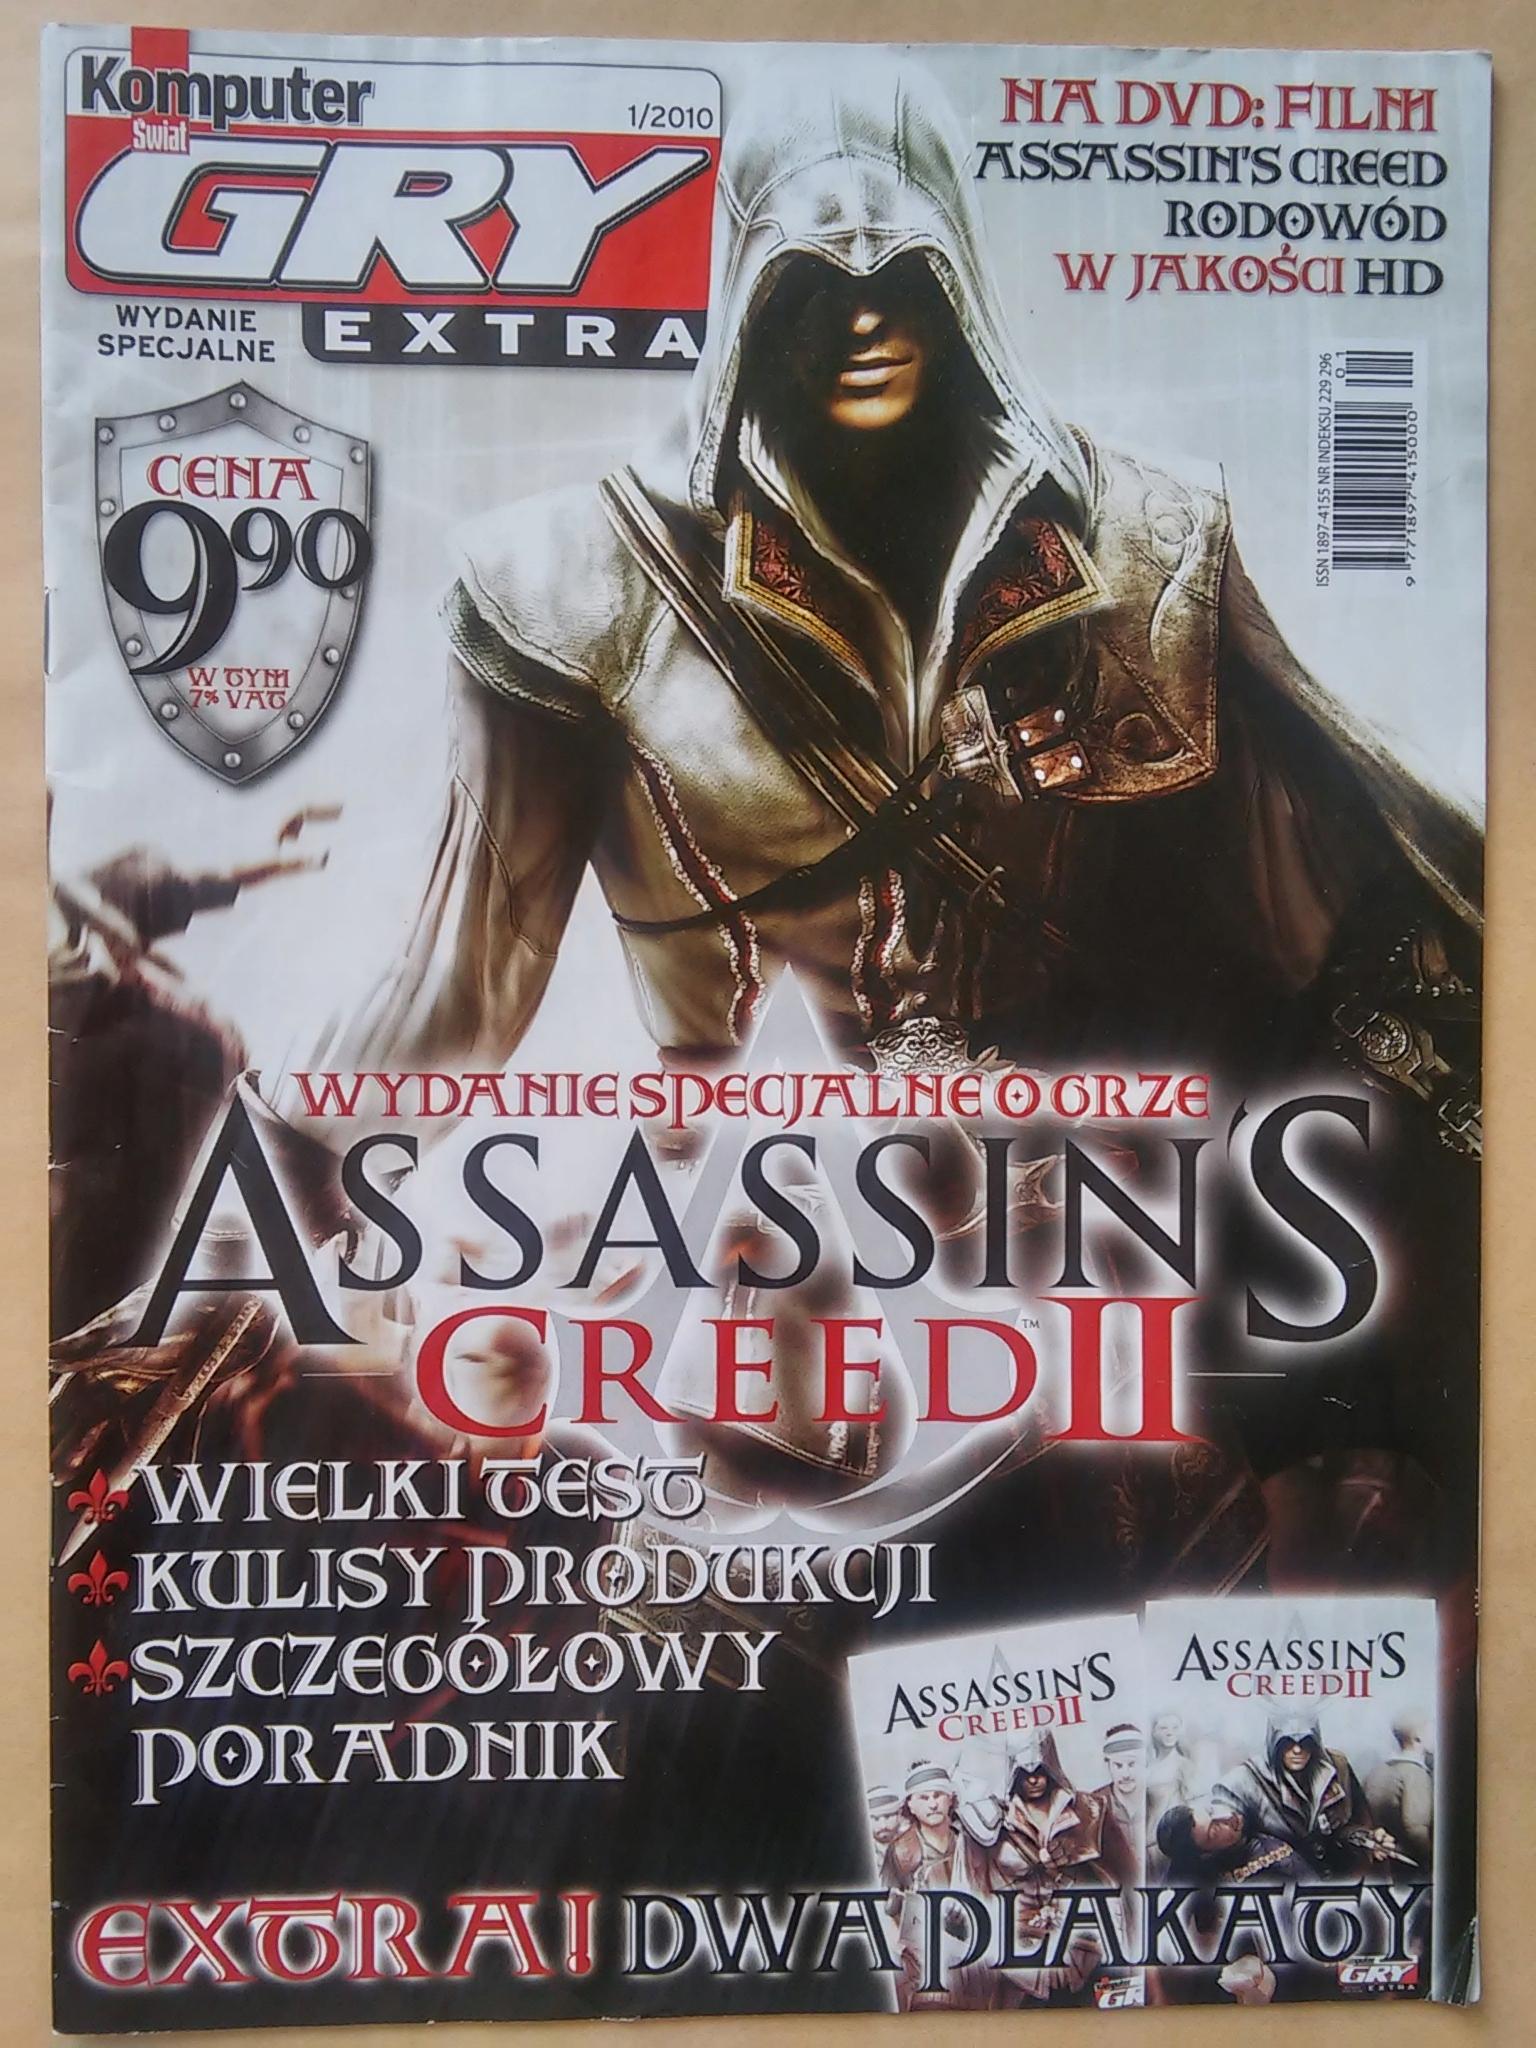 Komputer Świat Gry Extra 1/2010 Assassin's Creed